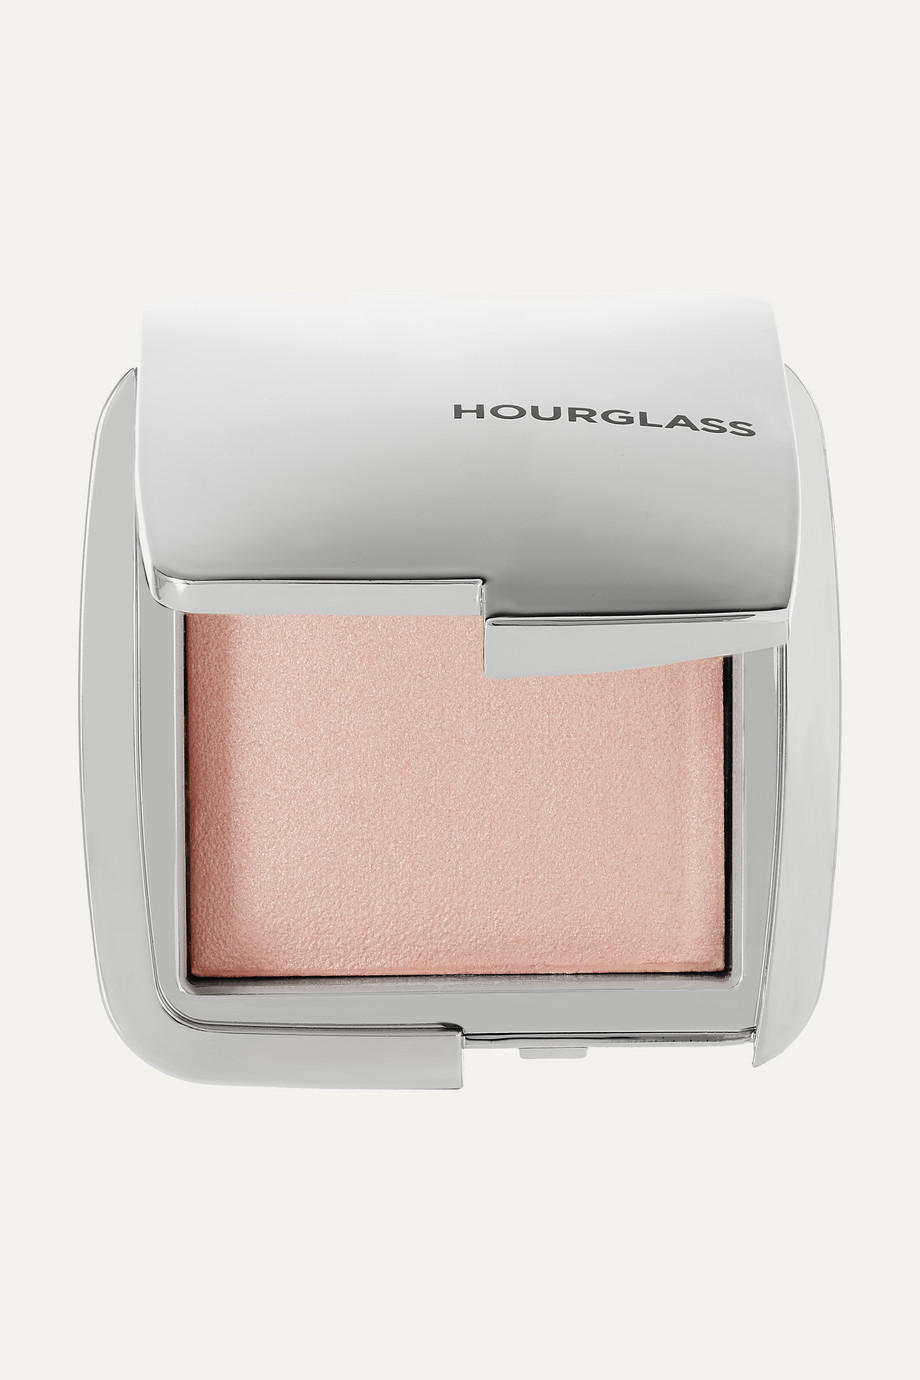 Hourglass Ambient® Strobe Lighting Powder - Euphoric Strobe Light